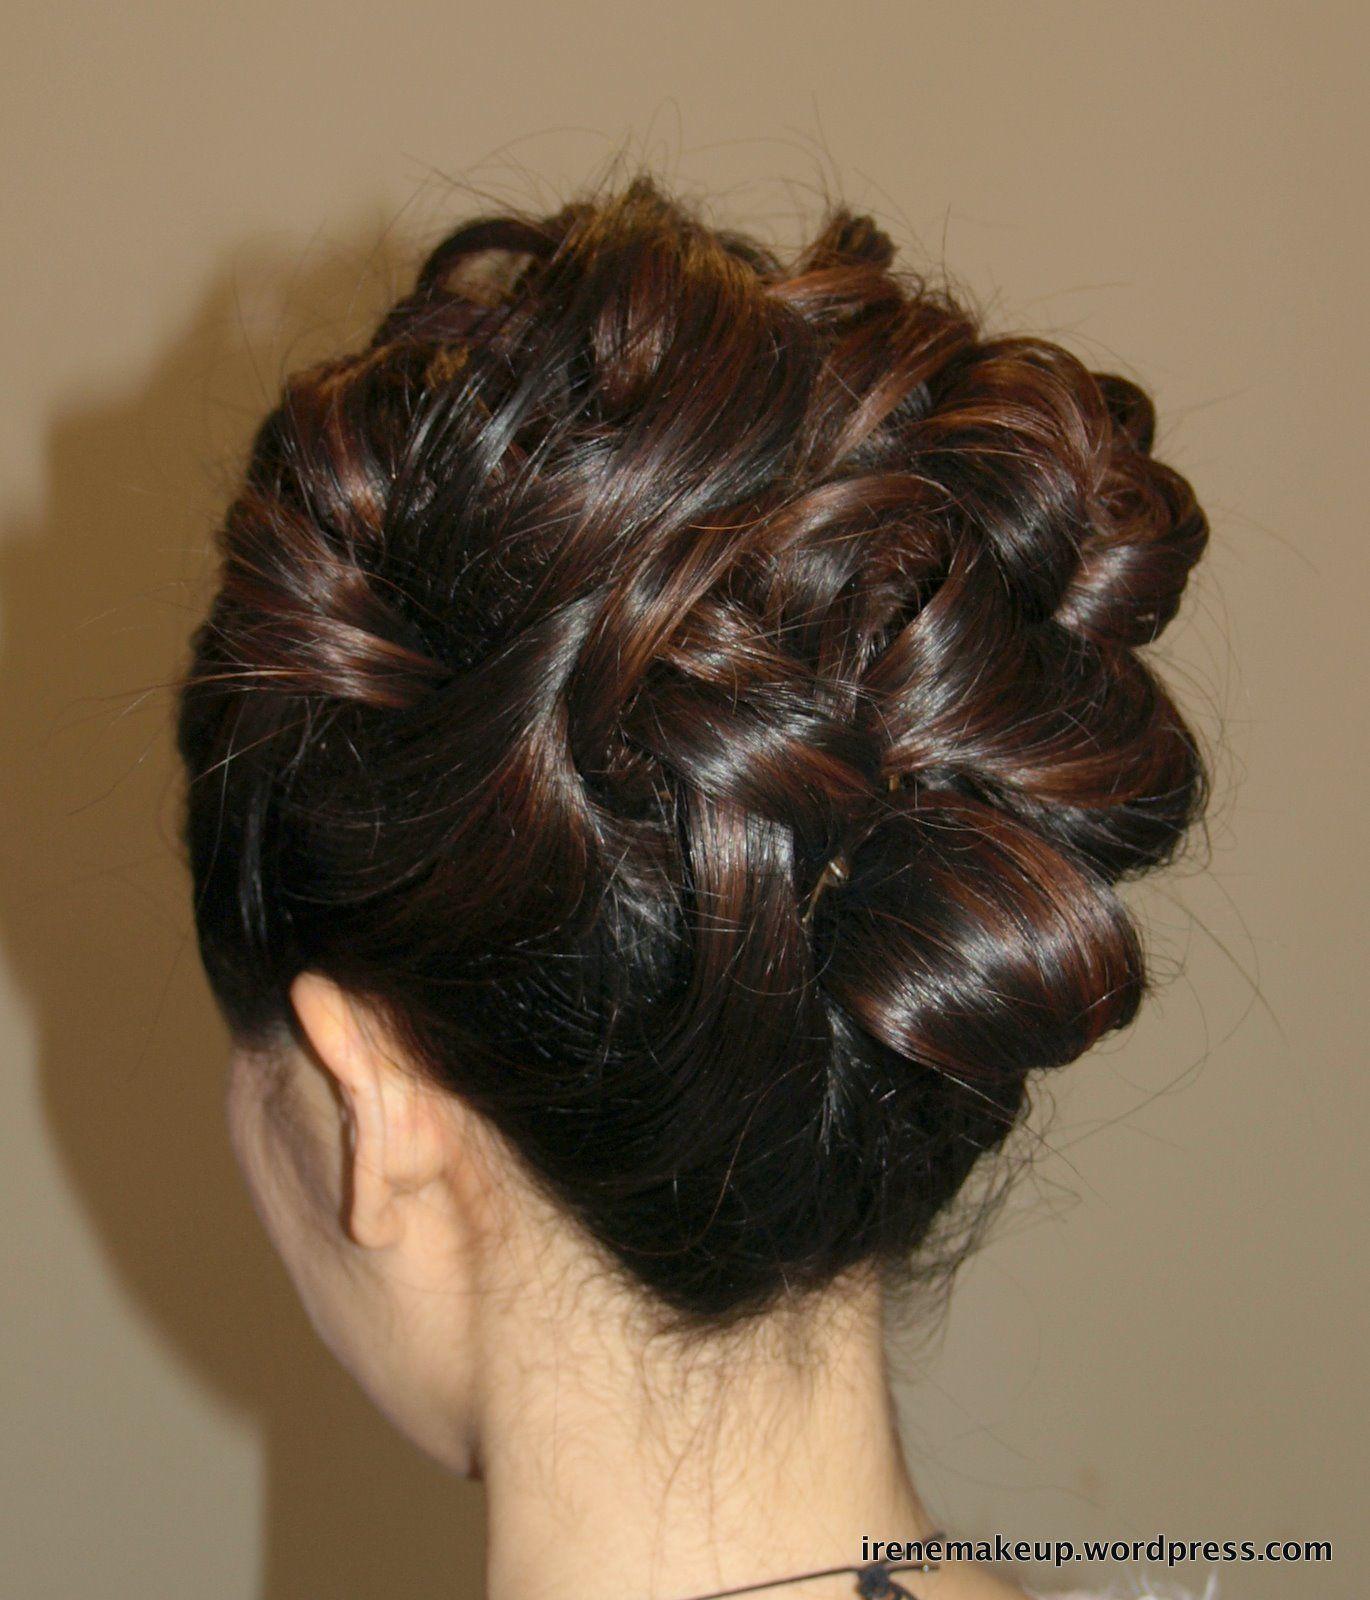 chinese bridal hairstyles- classic sleek updo 新娘盘头发型